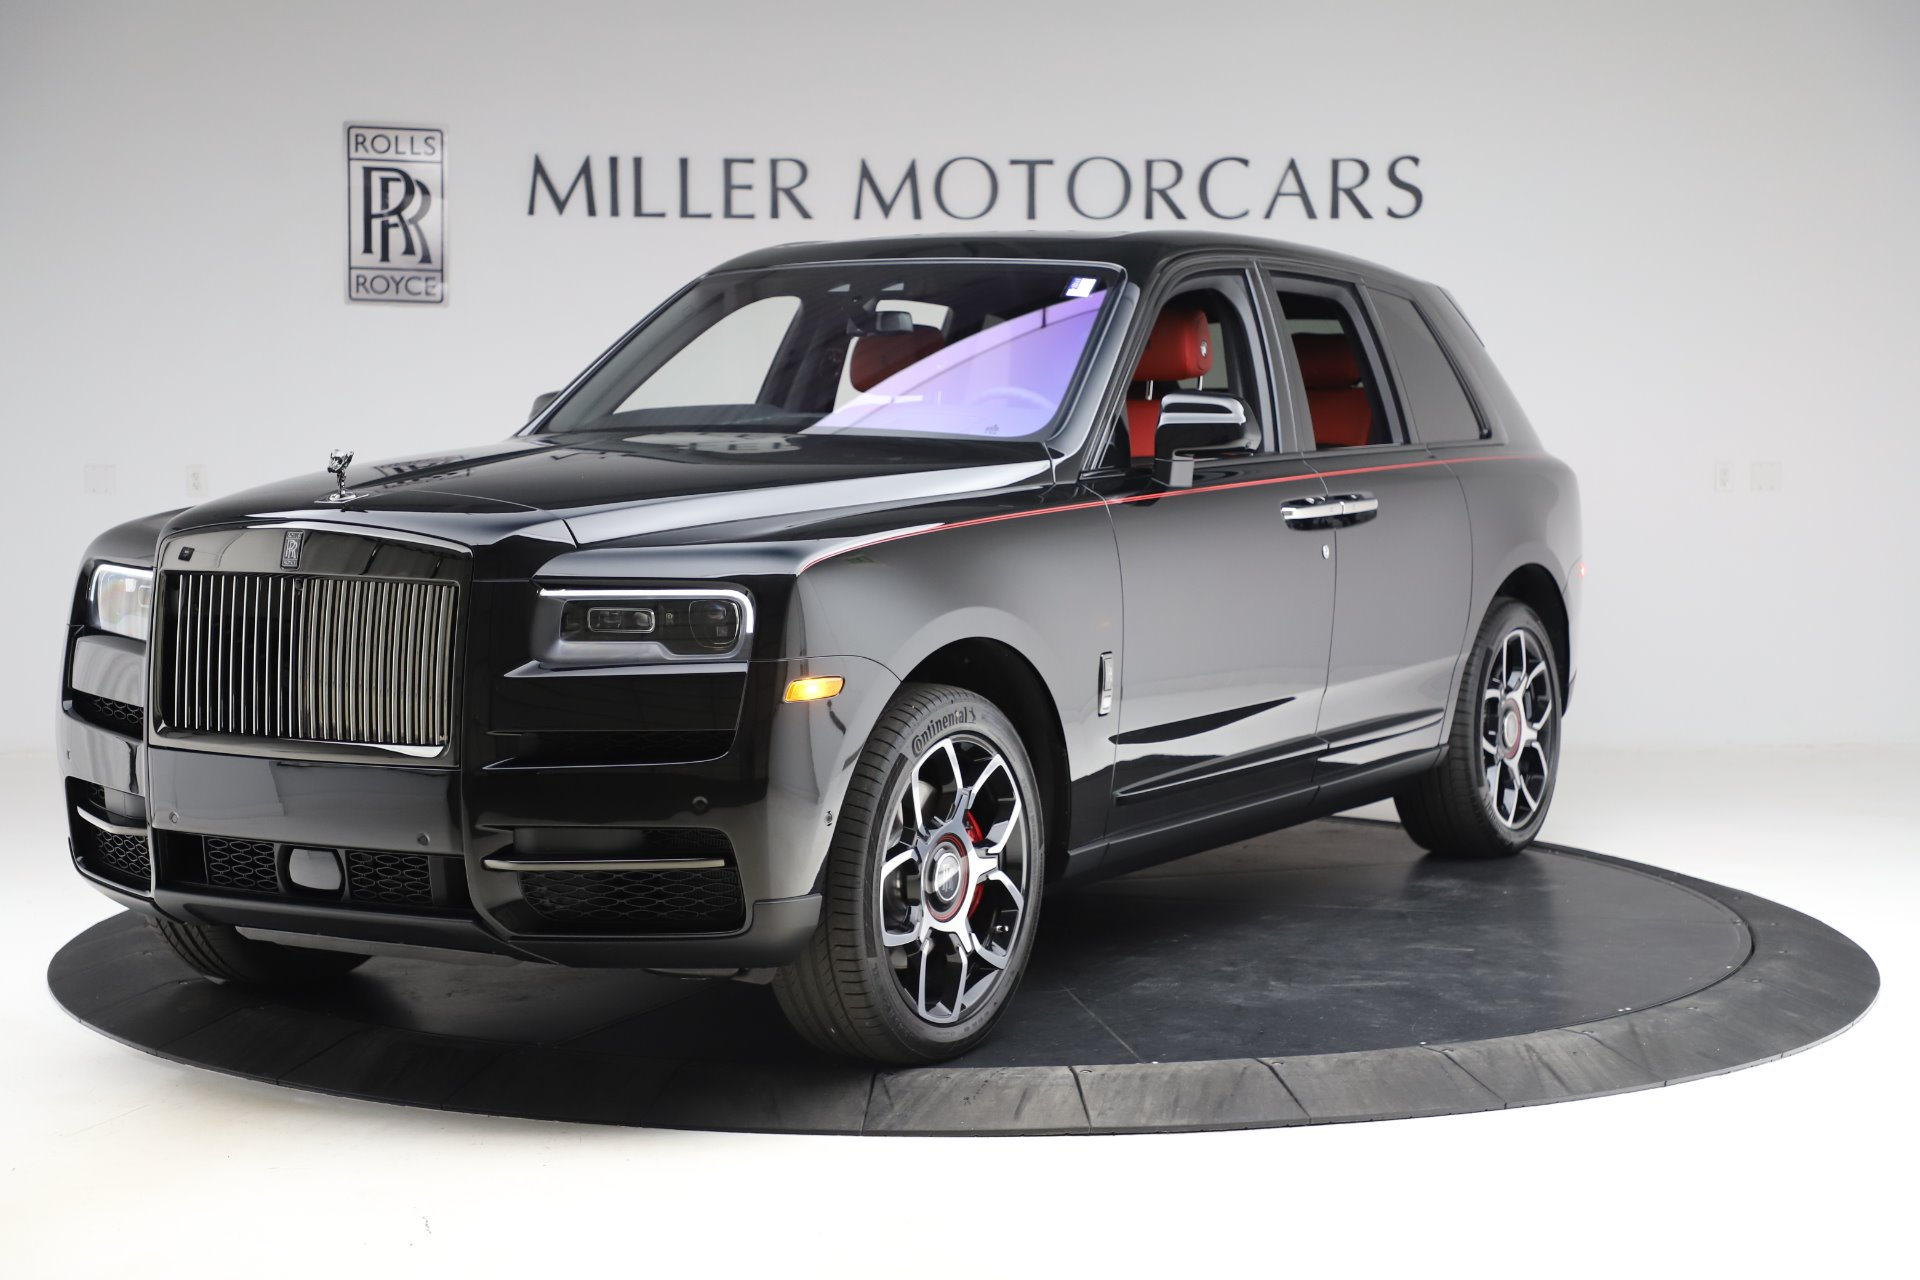 New 2020 Rolls-Royce Cullinan Black Badge for sale $433,950 at Rolls-Royce Motor Cars Greenwich in Greenwich CT 06830 1